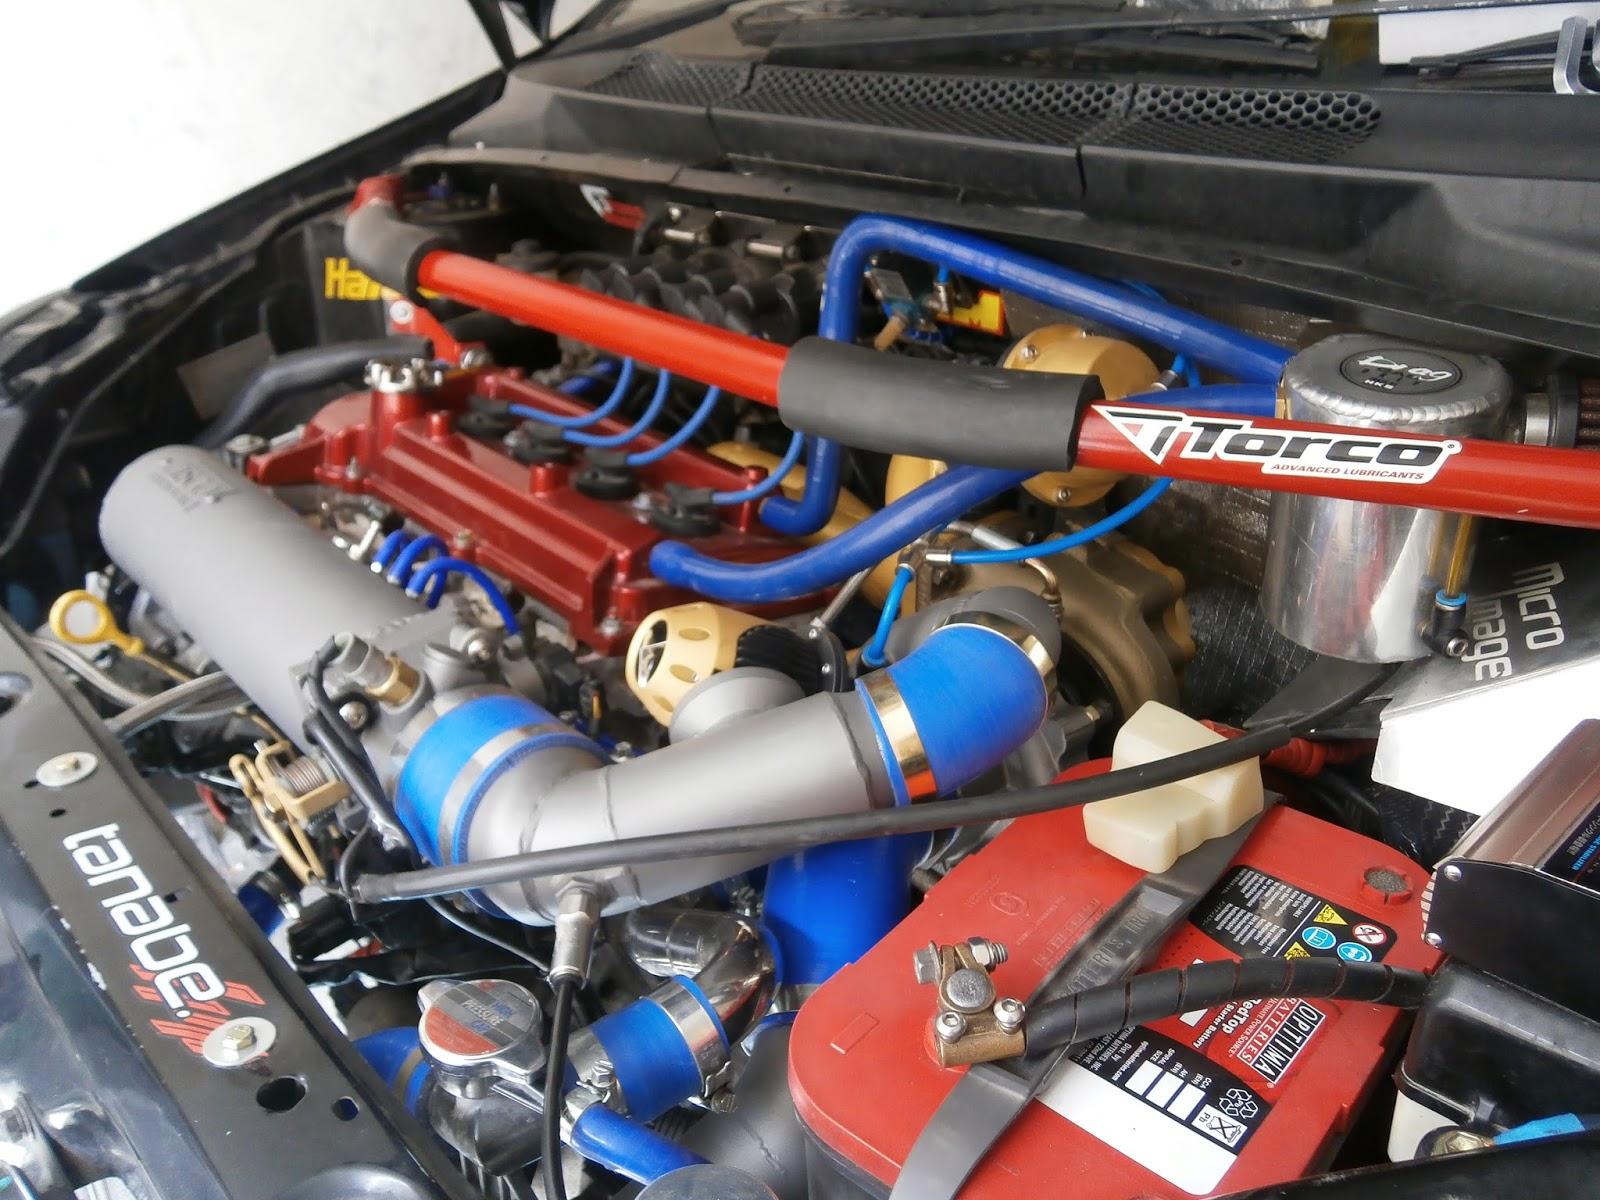 Toyota Yaris Trd Turbo Kit All New Kijang Innova Facelift Vios World S First 500 Whp 1nz Fe Electronics Haltech Platinum Sport 1000 Ecu Full Aem Boost Oil Water Injection Flow Meters